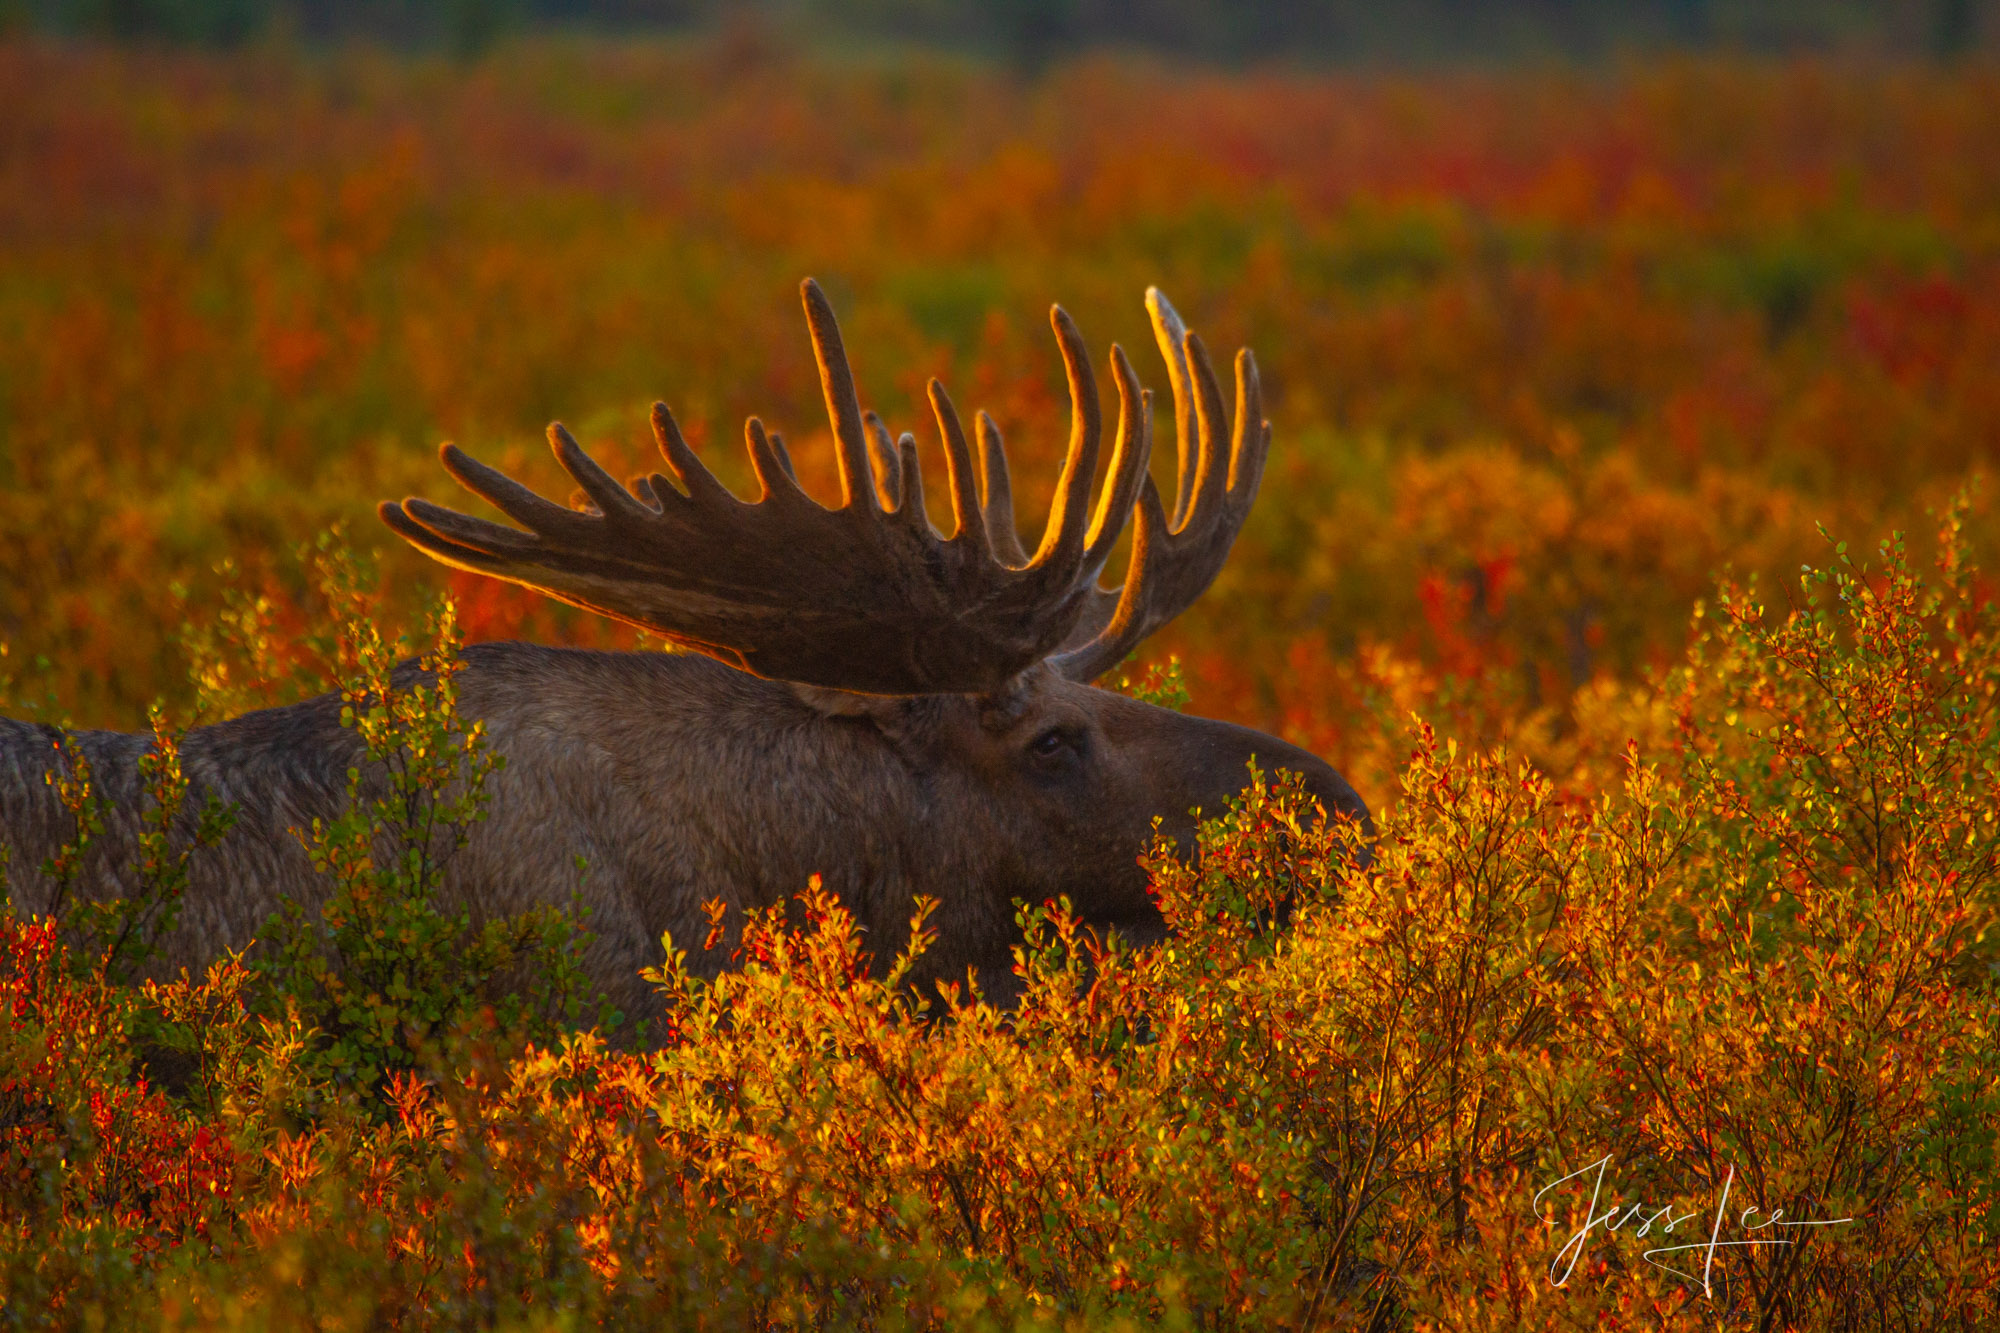 Denali Alaska, bull Moose feeding in the tundra at sunrise. A limited edition of 800 prints. These Moose fine art Wildlife photographs...